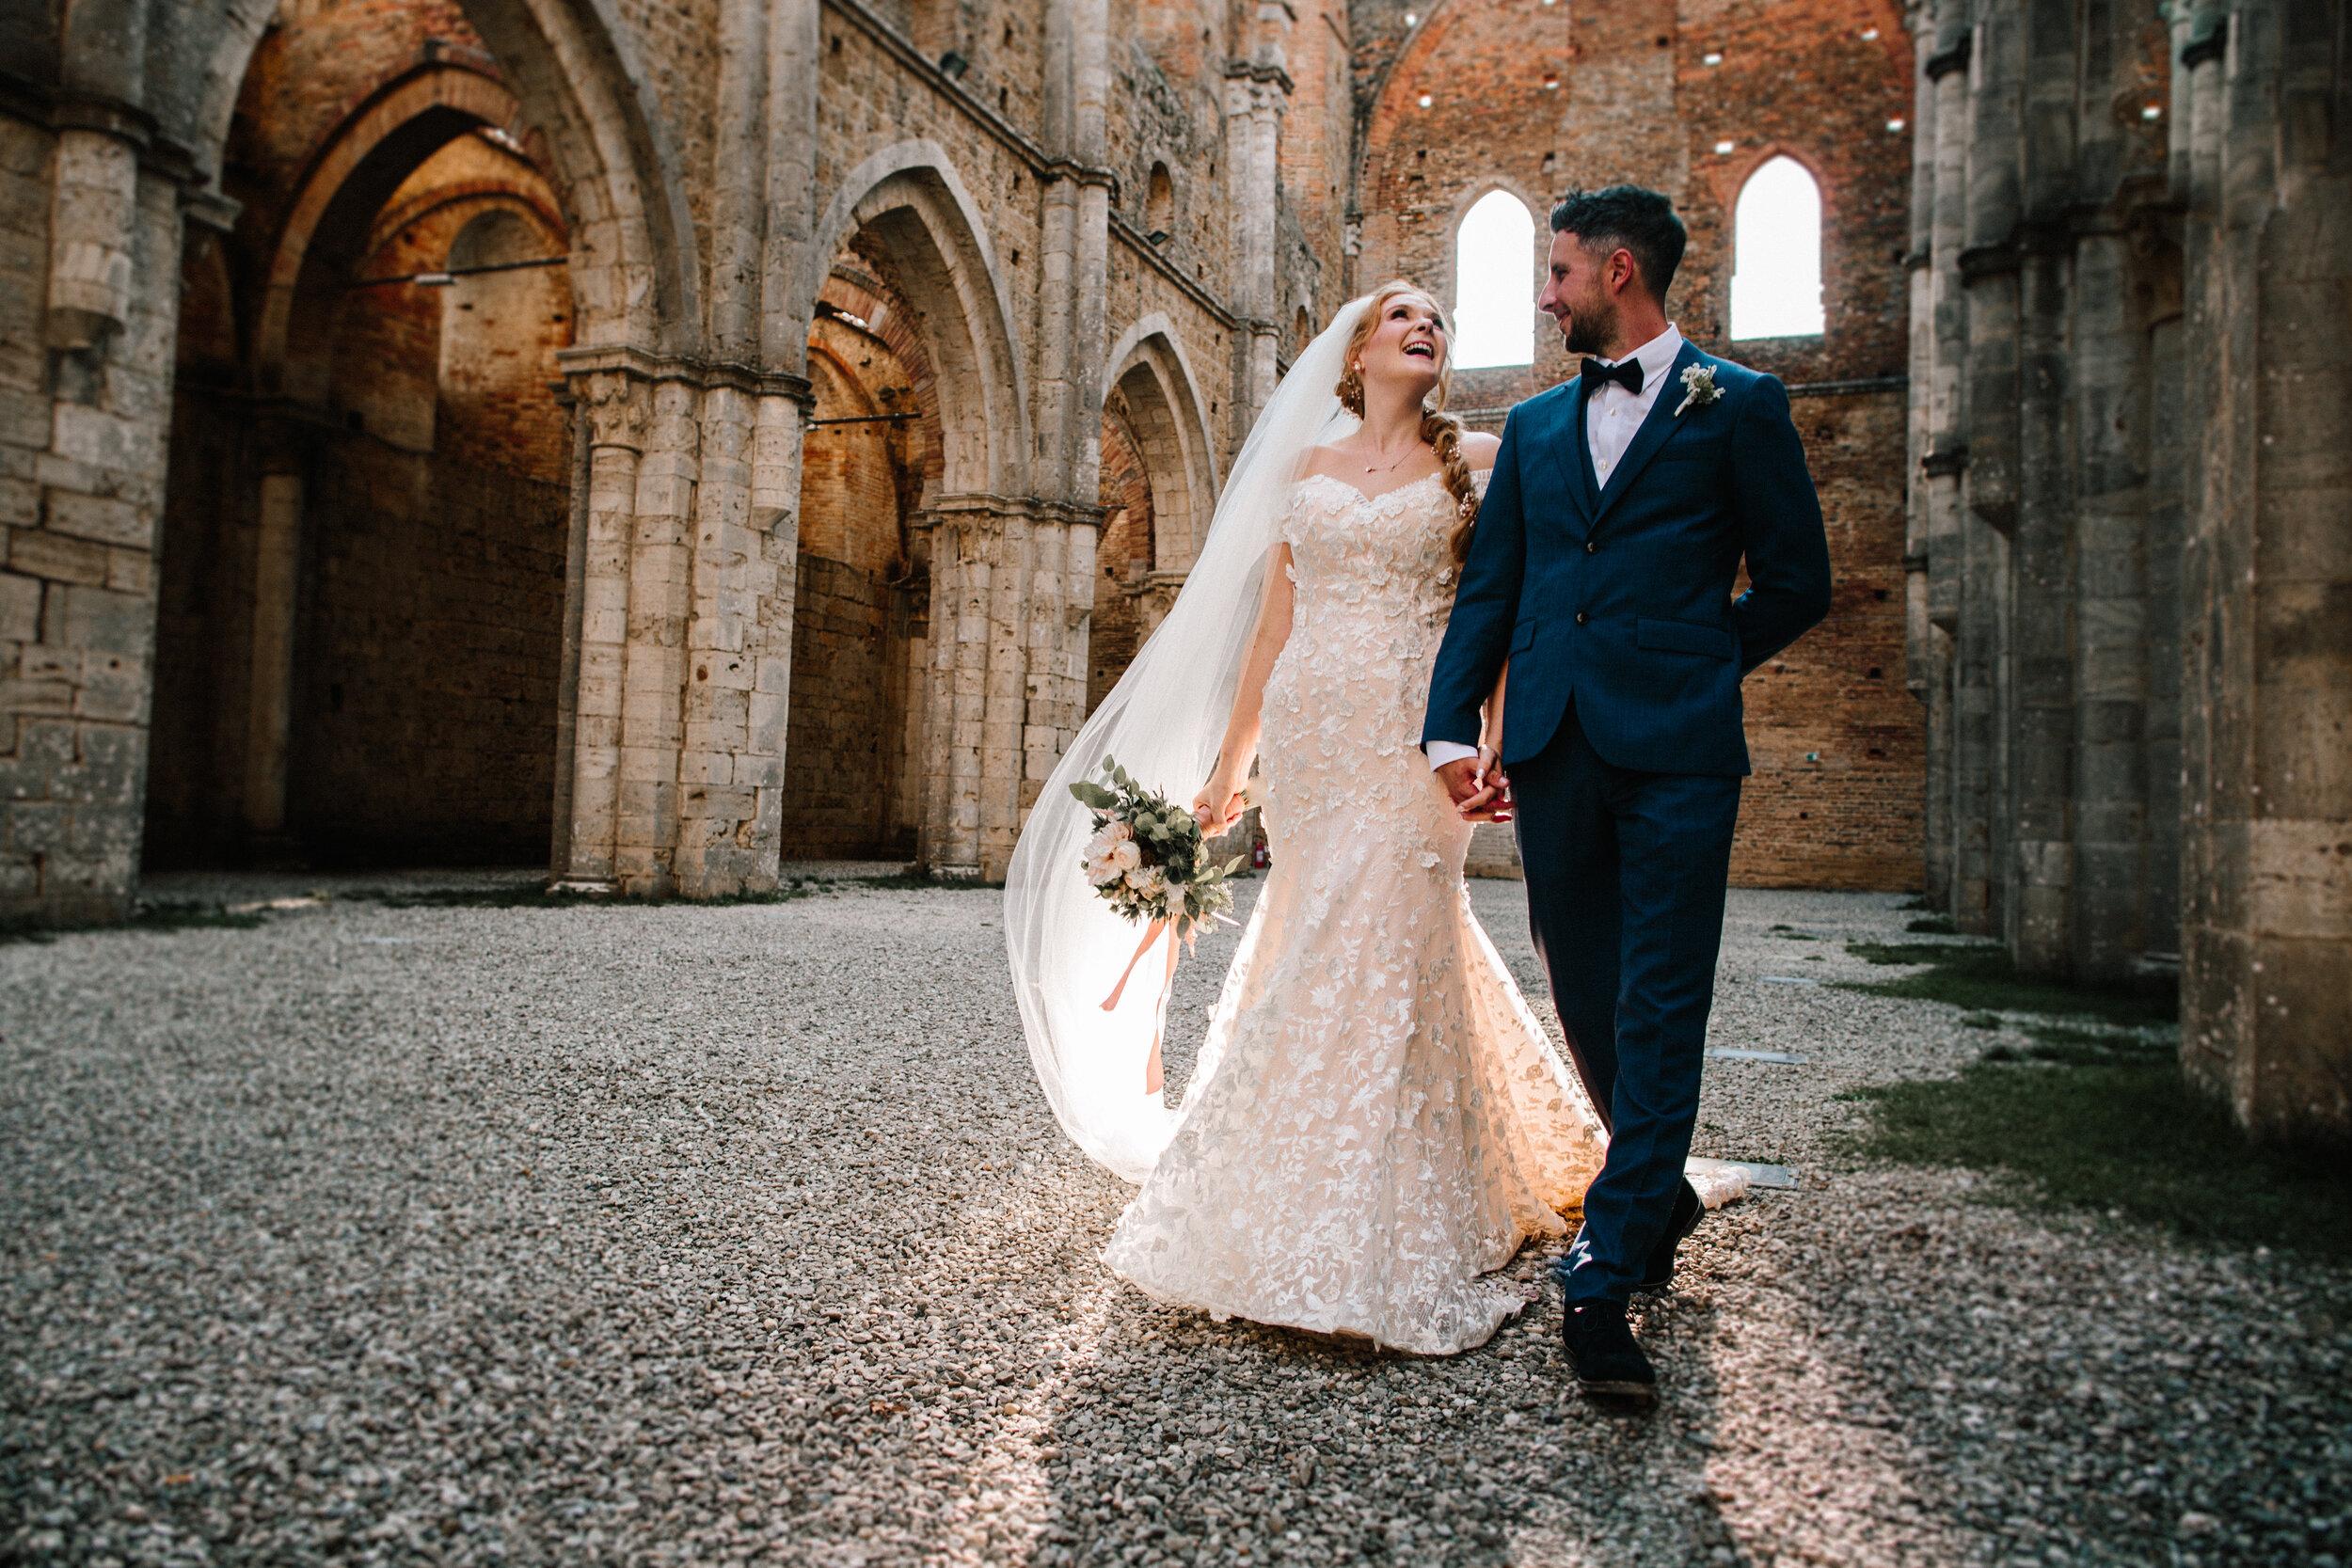 Gemma & Chris San Galgano Wedding in Tuscany by Fresh Shoot Studios -27.jpg